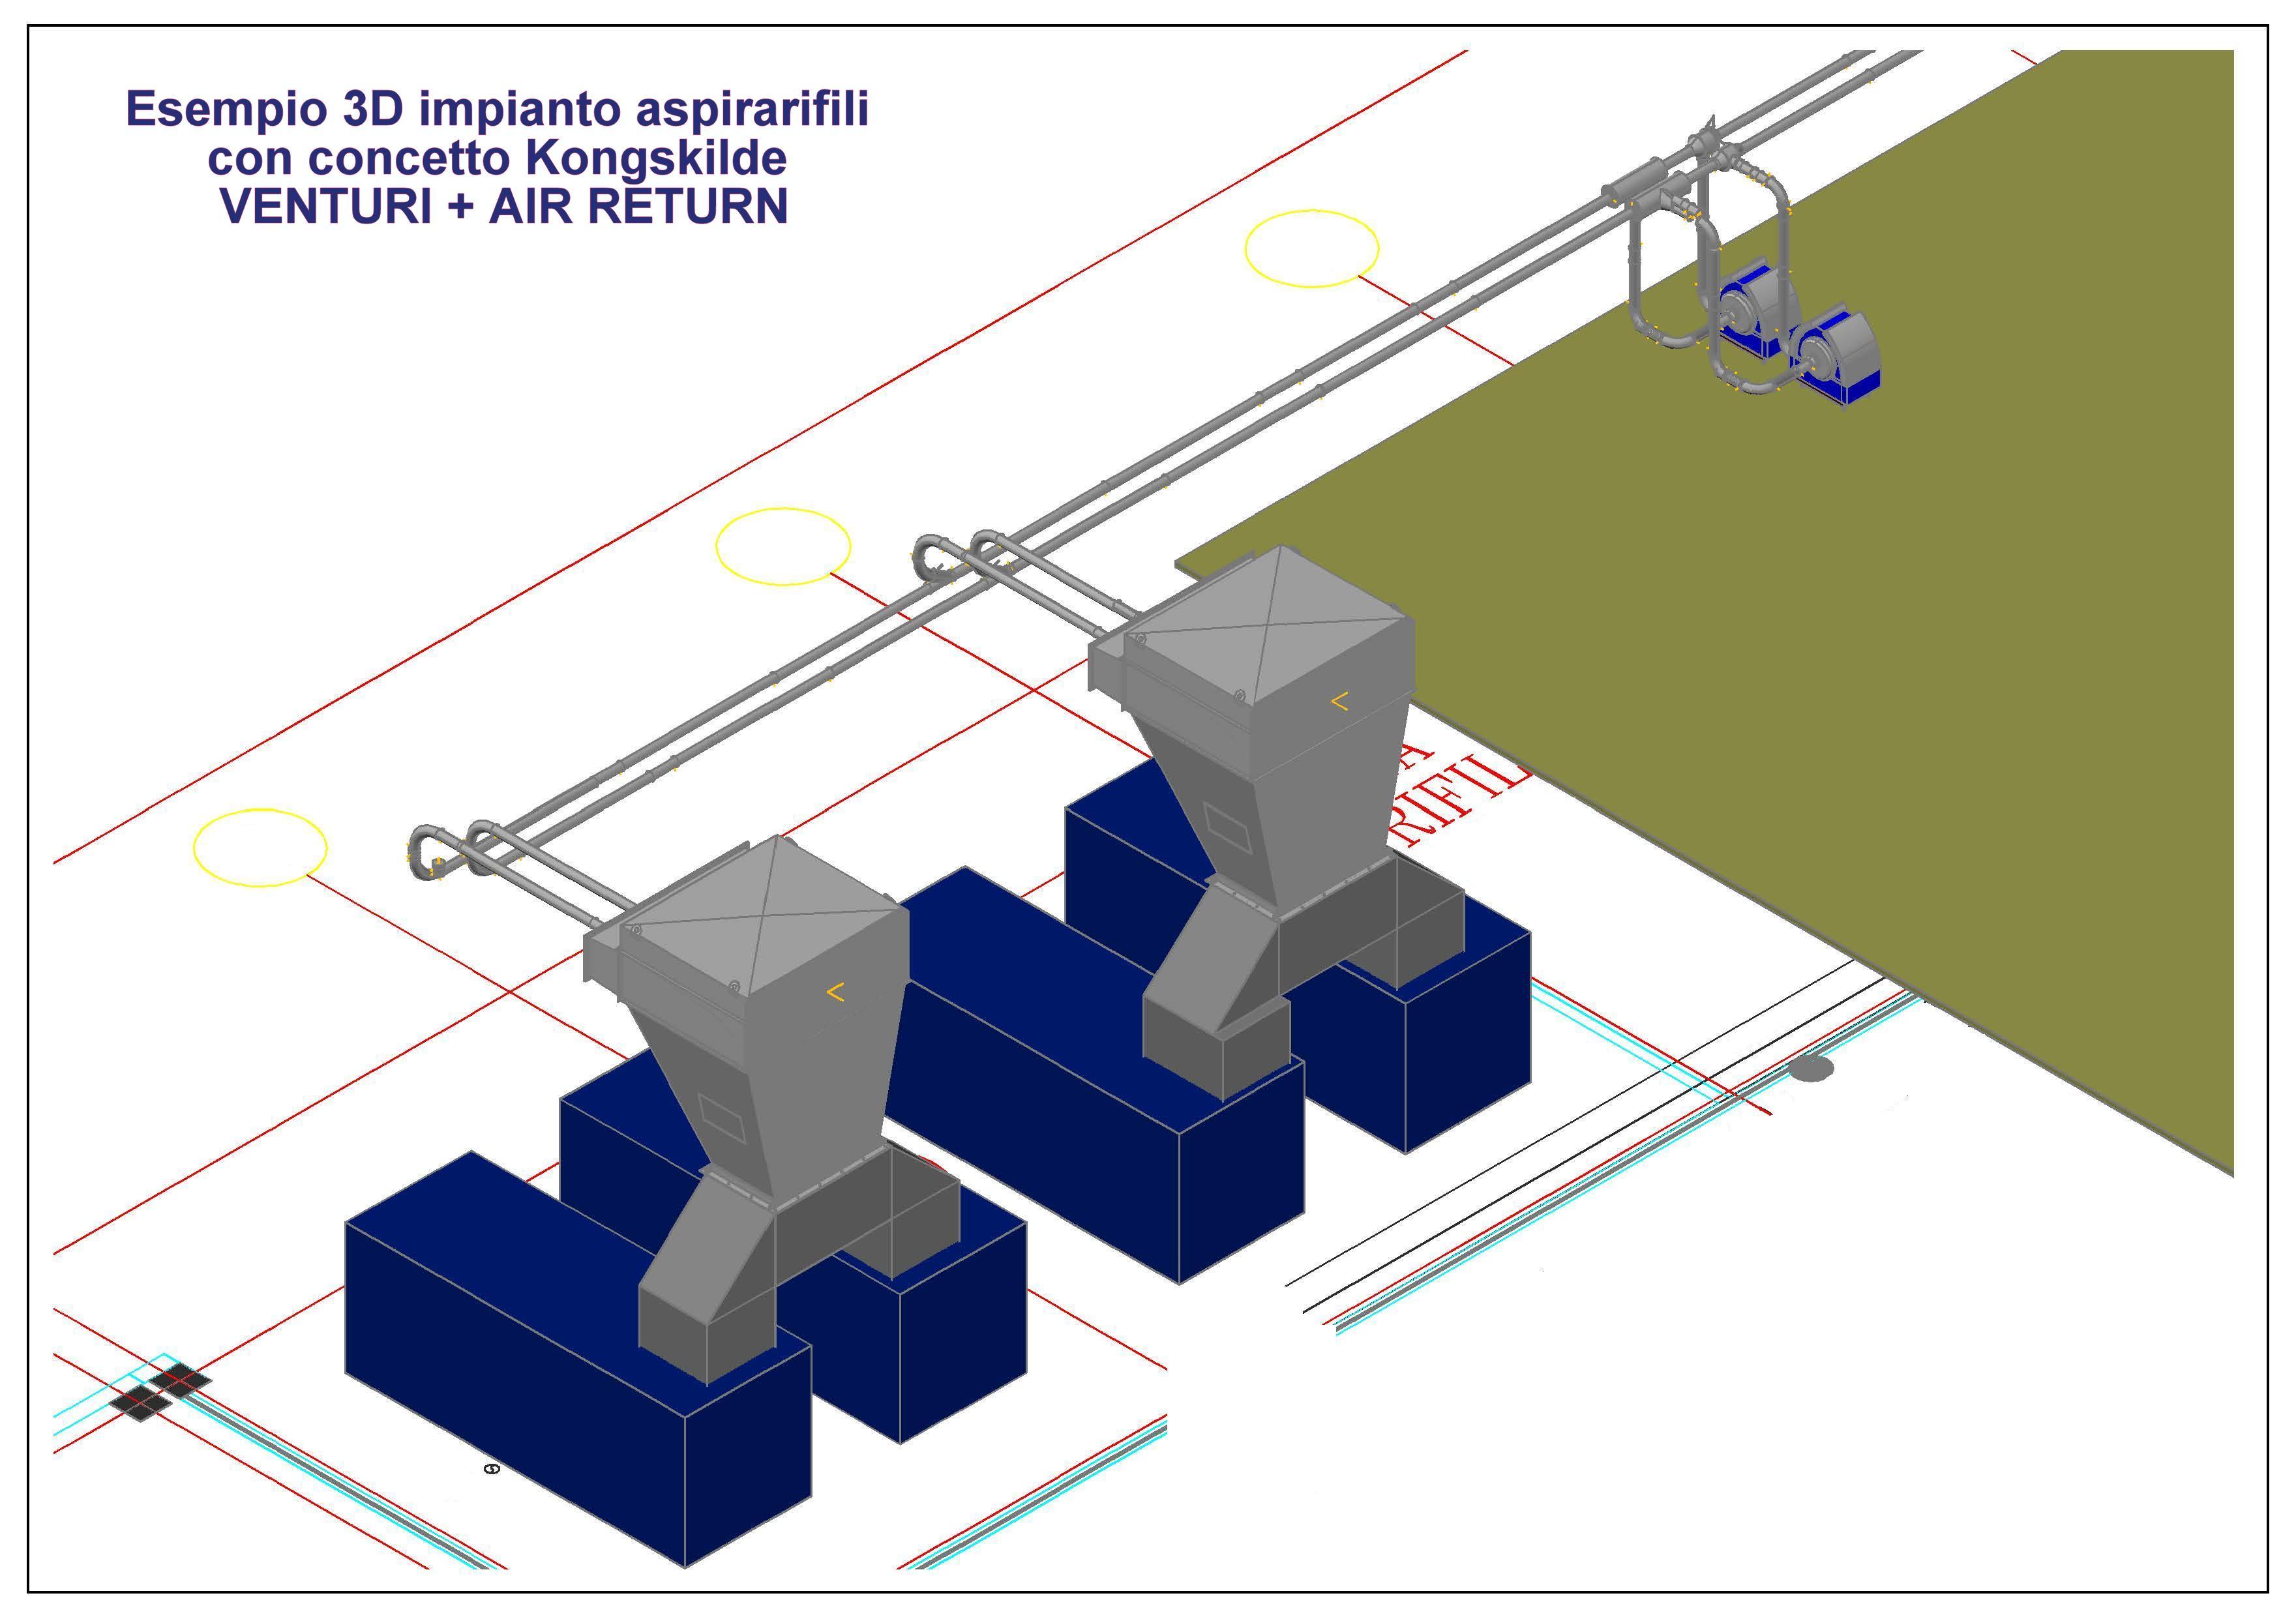 3D VENTURI+AIR RETURN